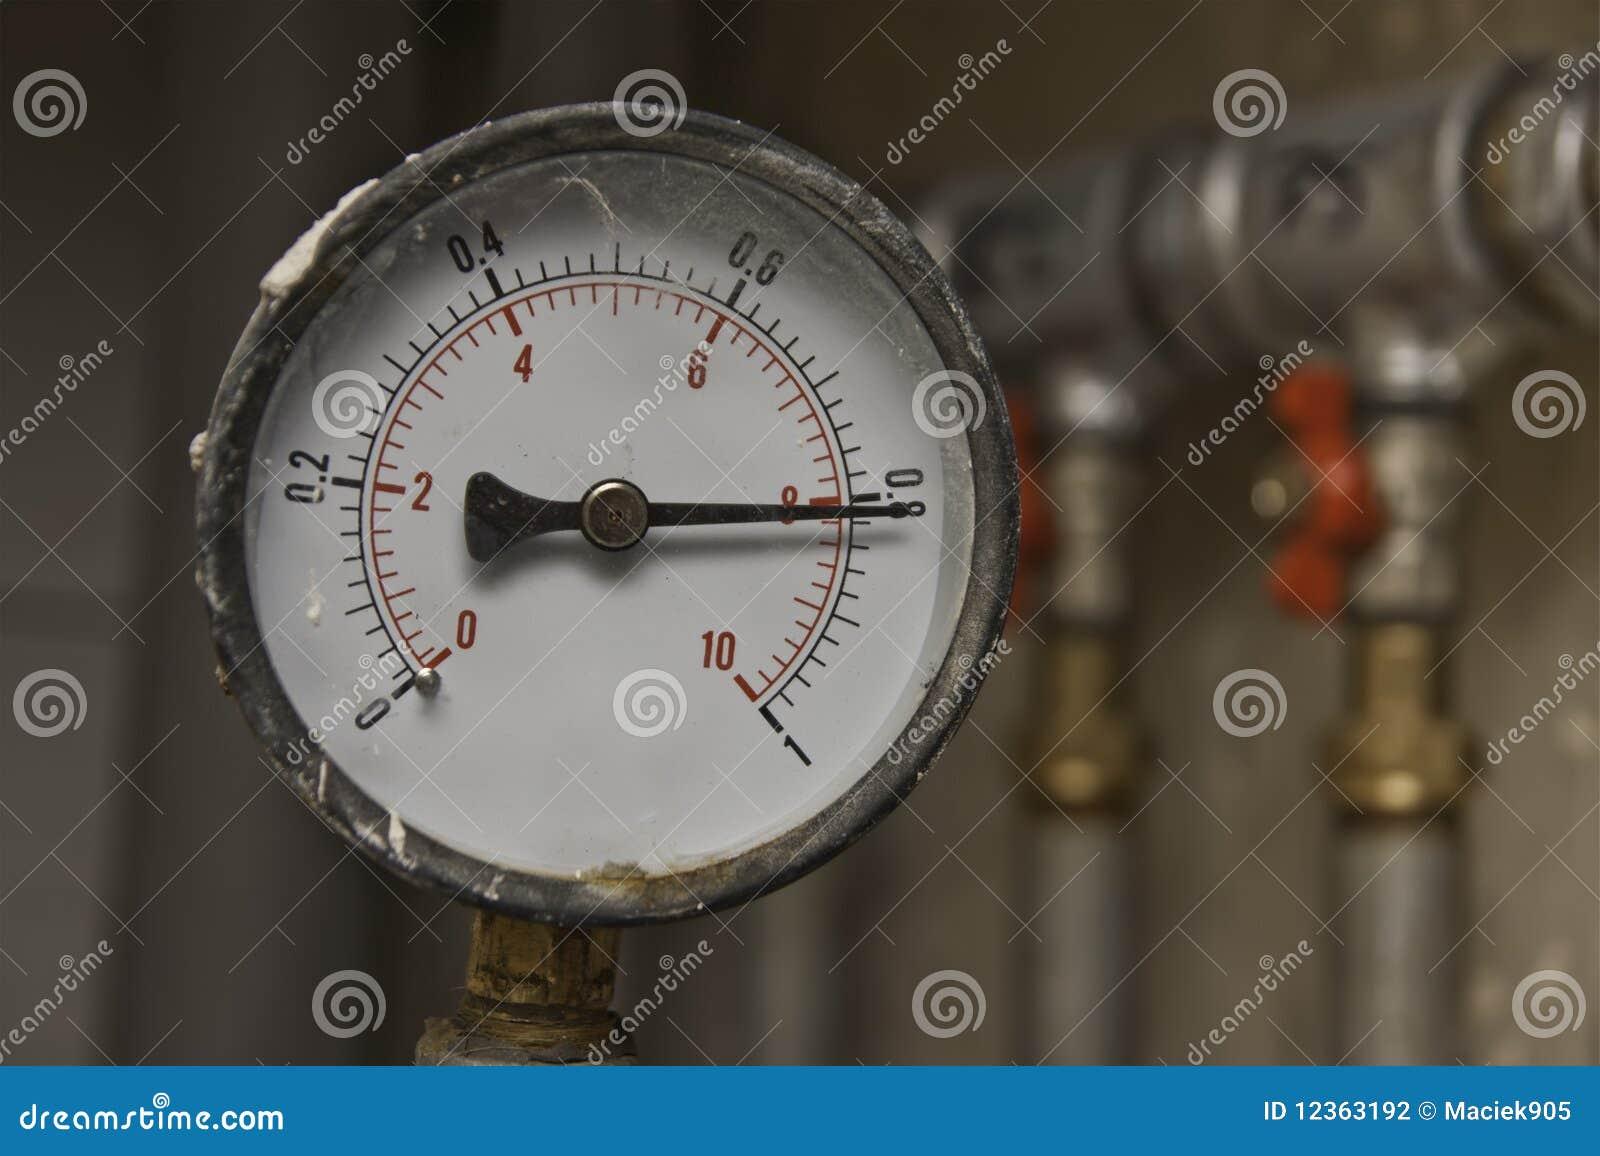 Industrial pressure meter and water pipes